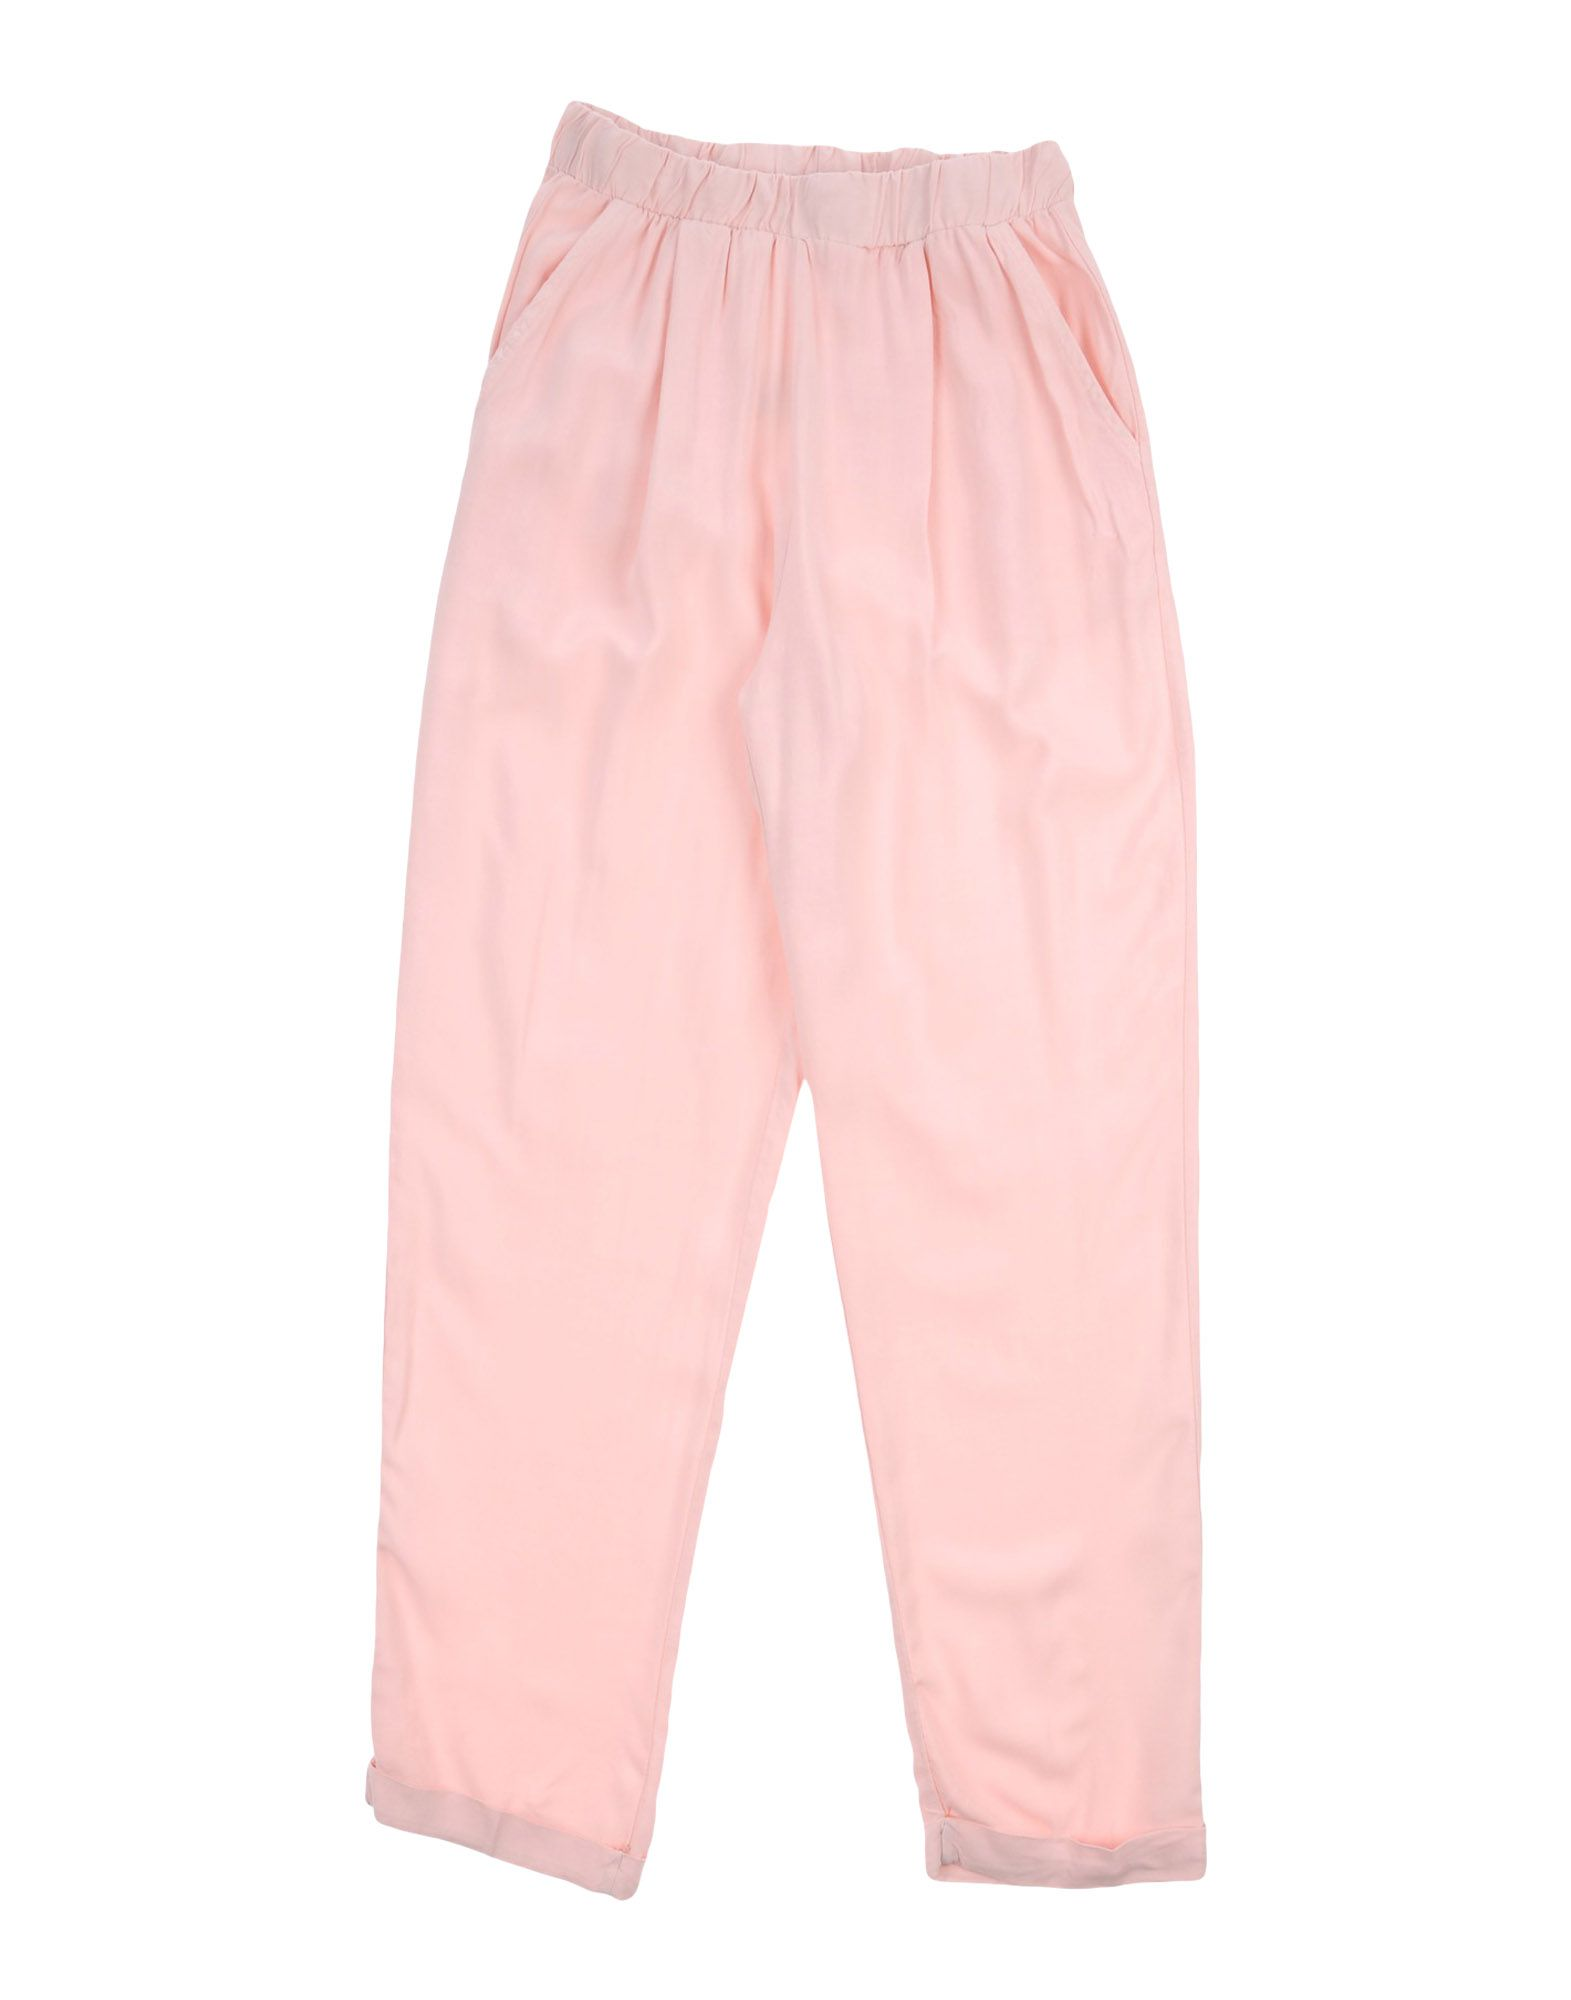 UNIC Повседневные брюки цена и фото